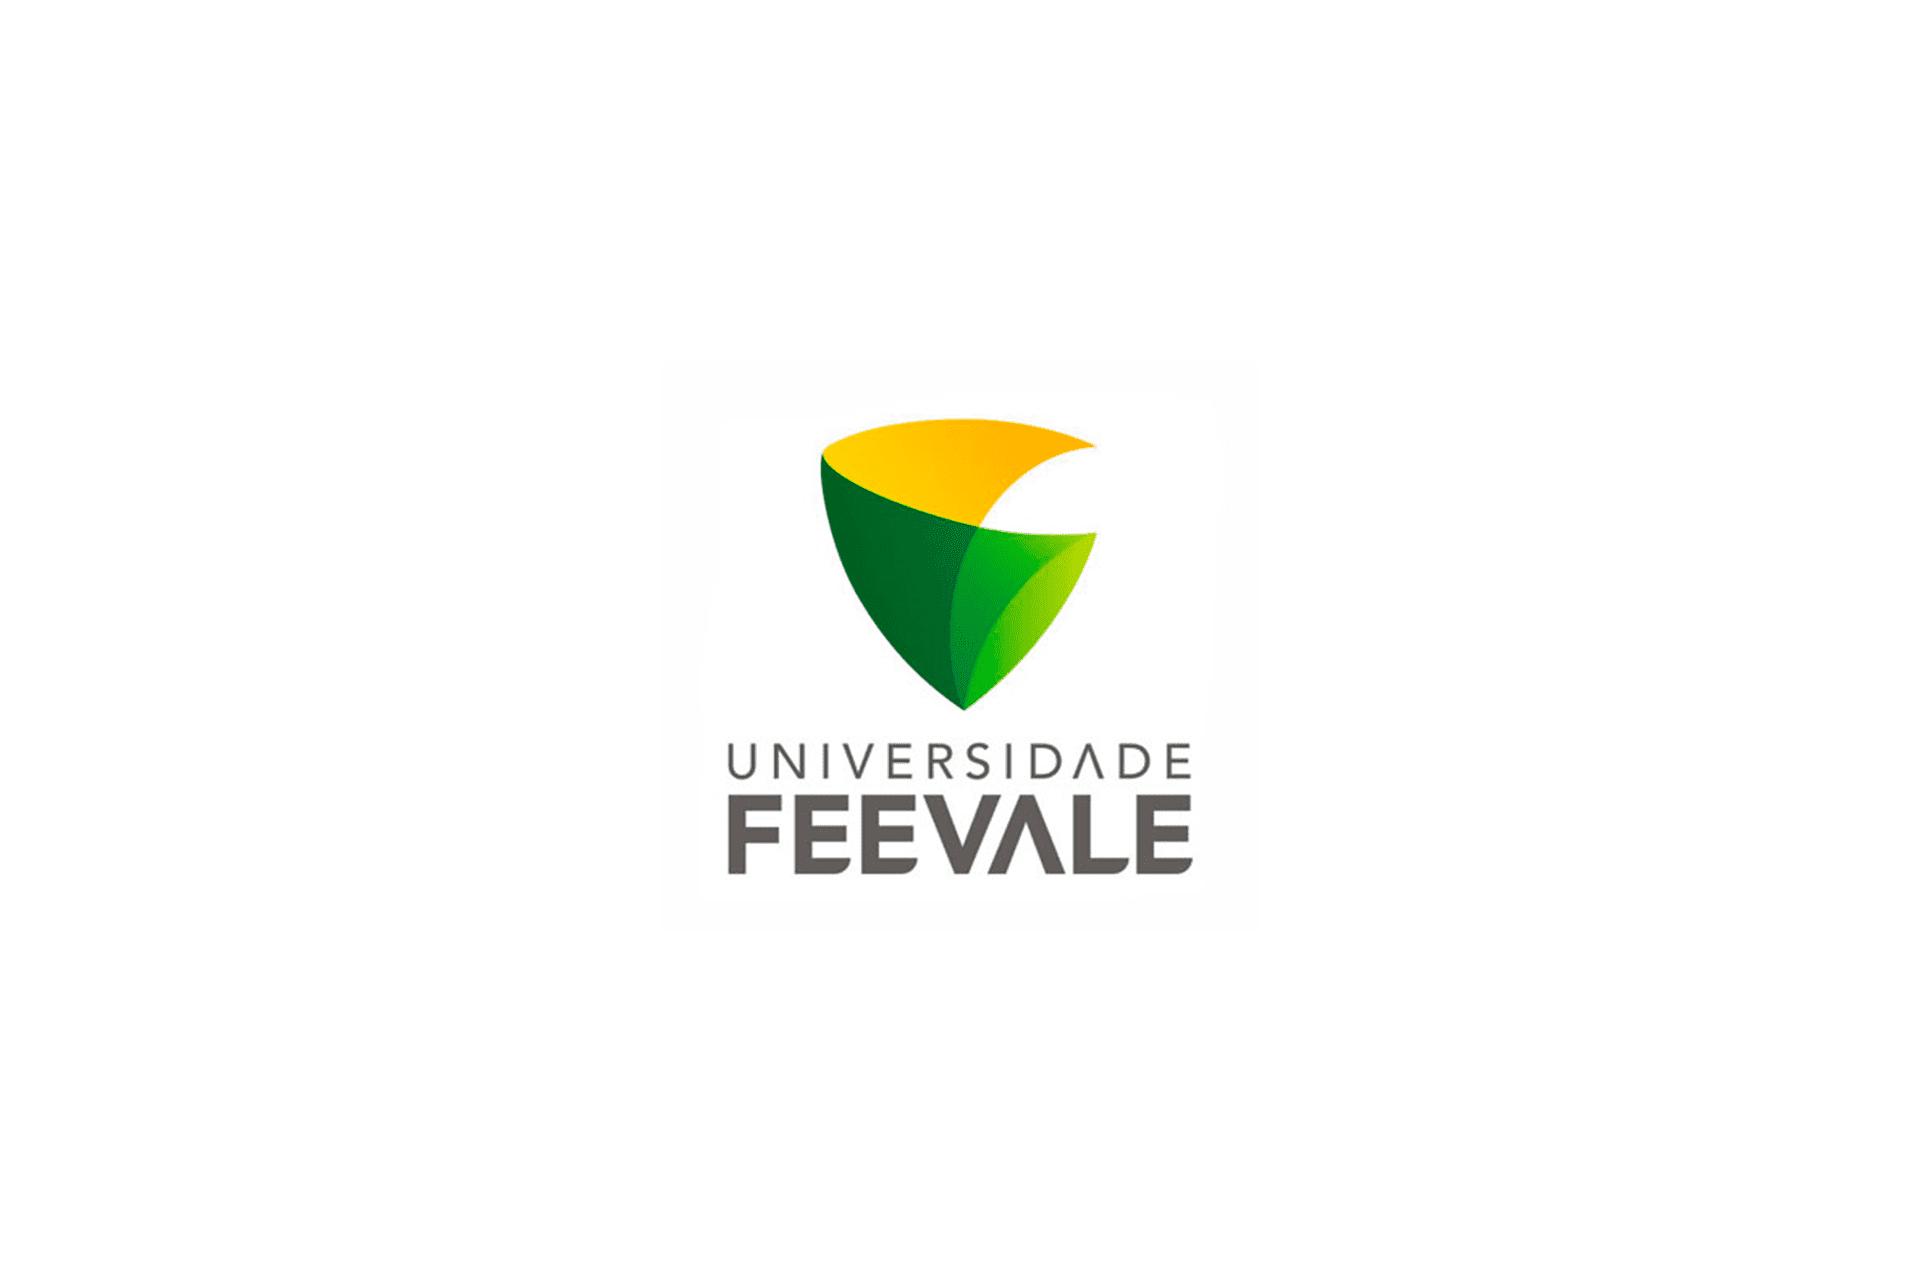 freevale